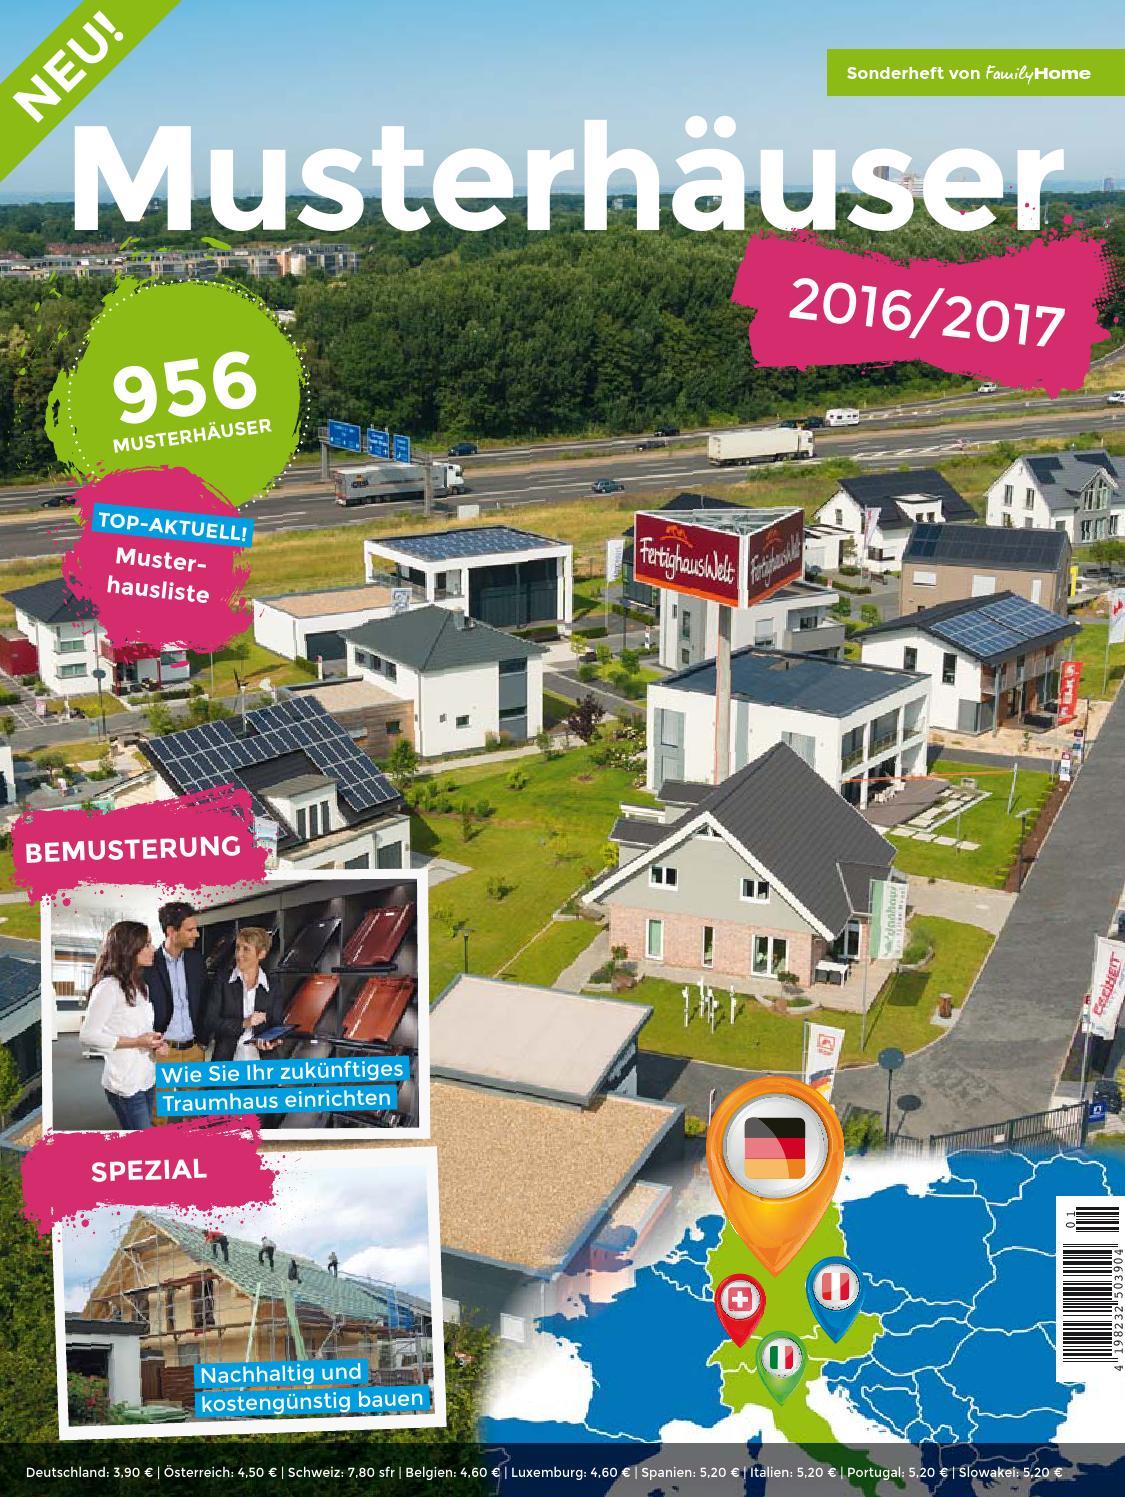 ^ Musterhäuser 2015/2016 by Family Home Verlag GmbH - issuu